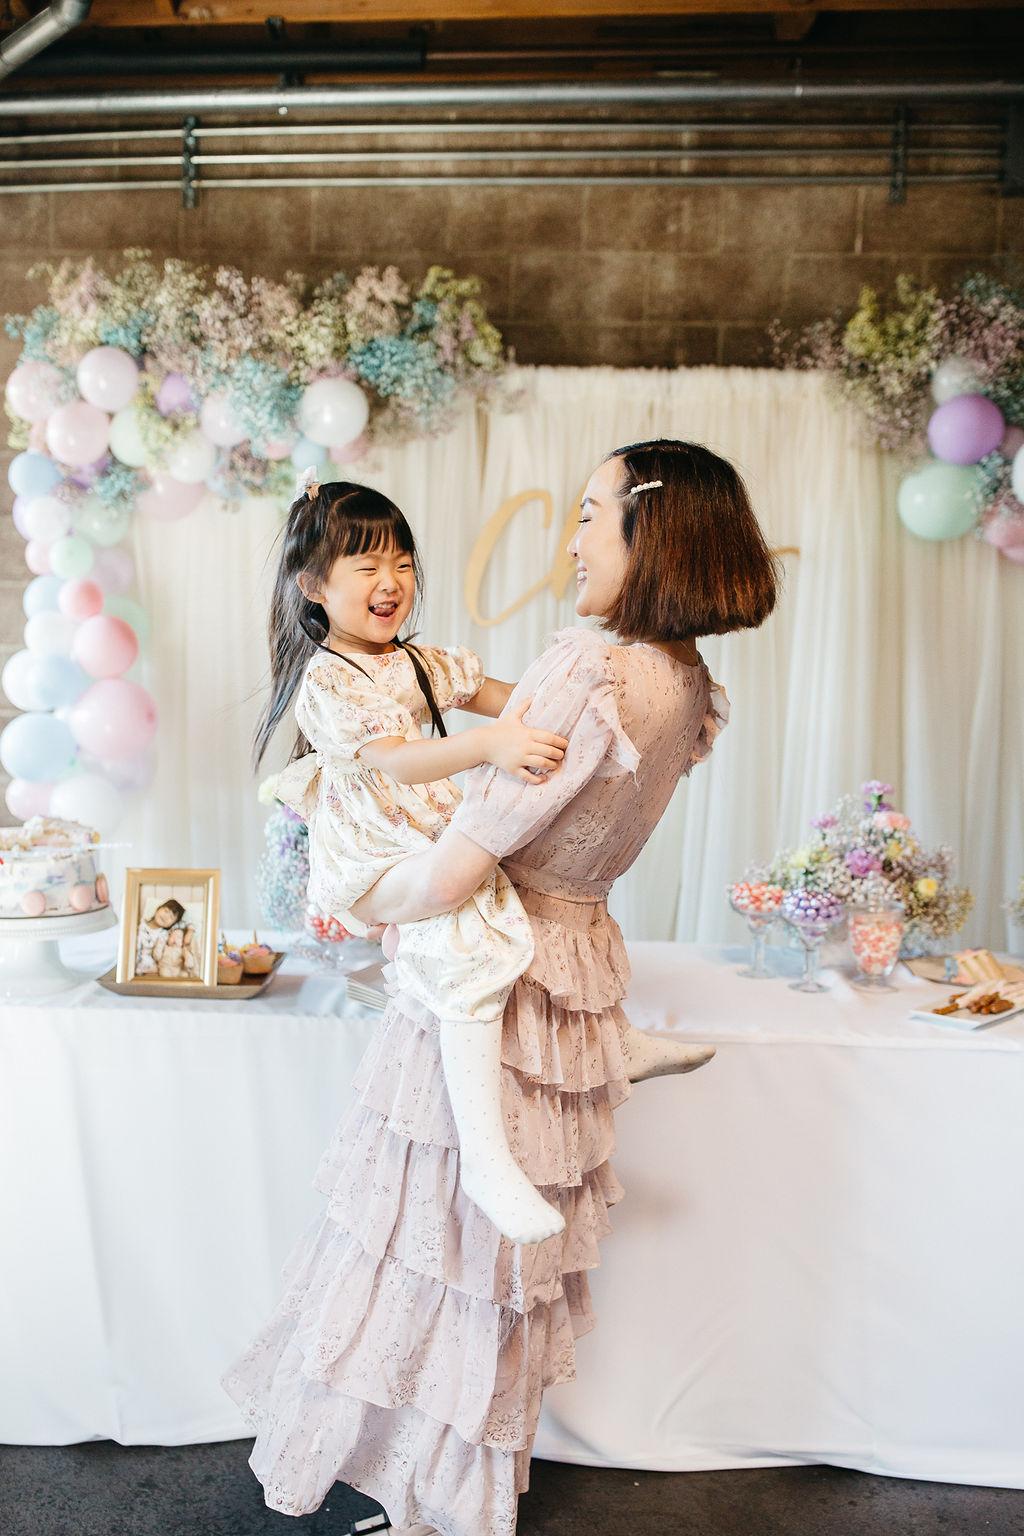 Birthday Party Chloe Chriselle Lim Event Photographer Joy Theory Co